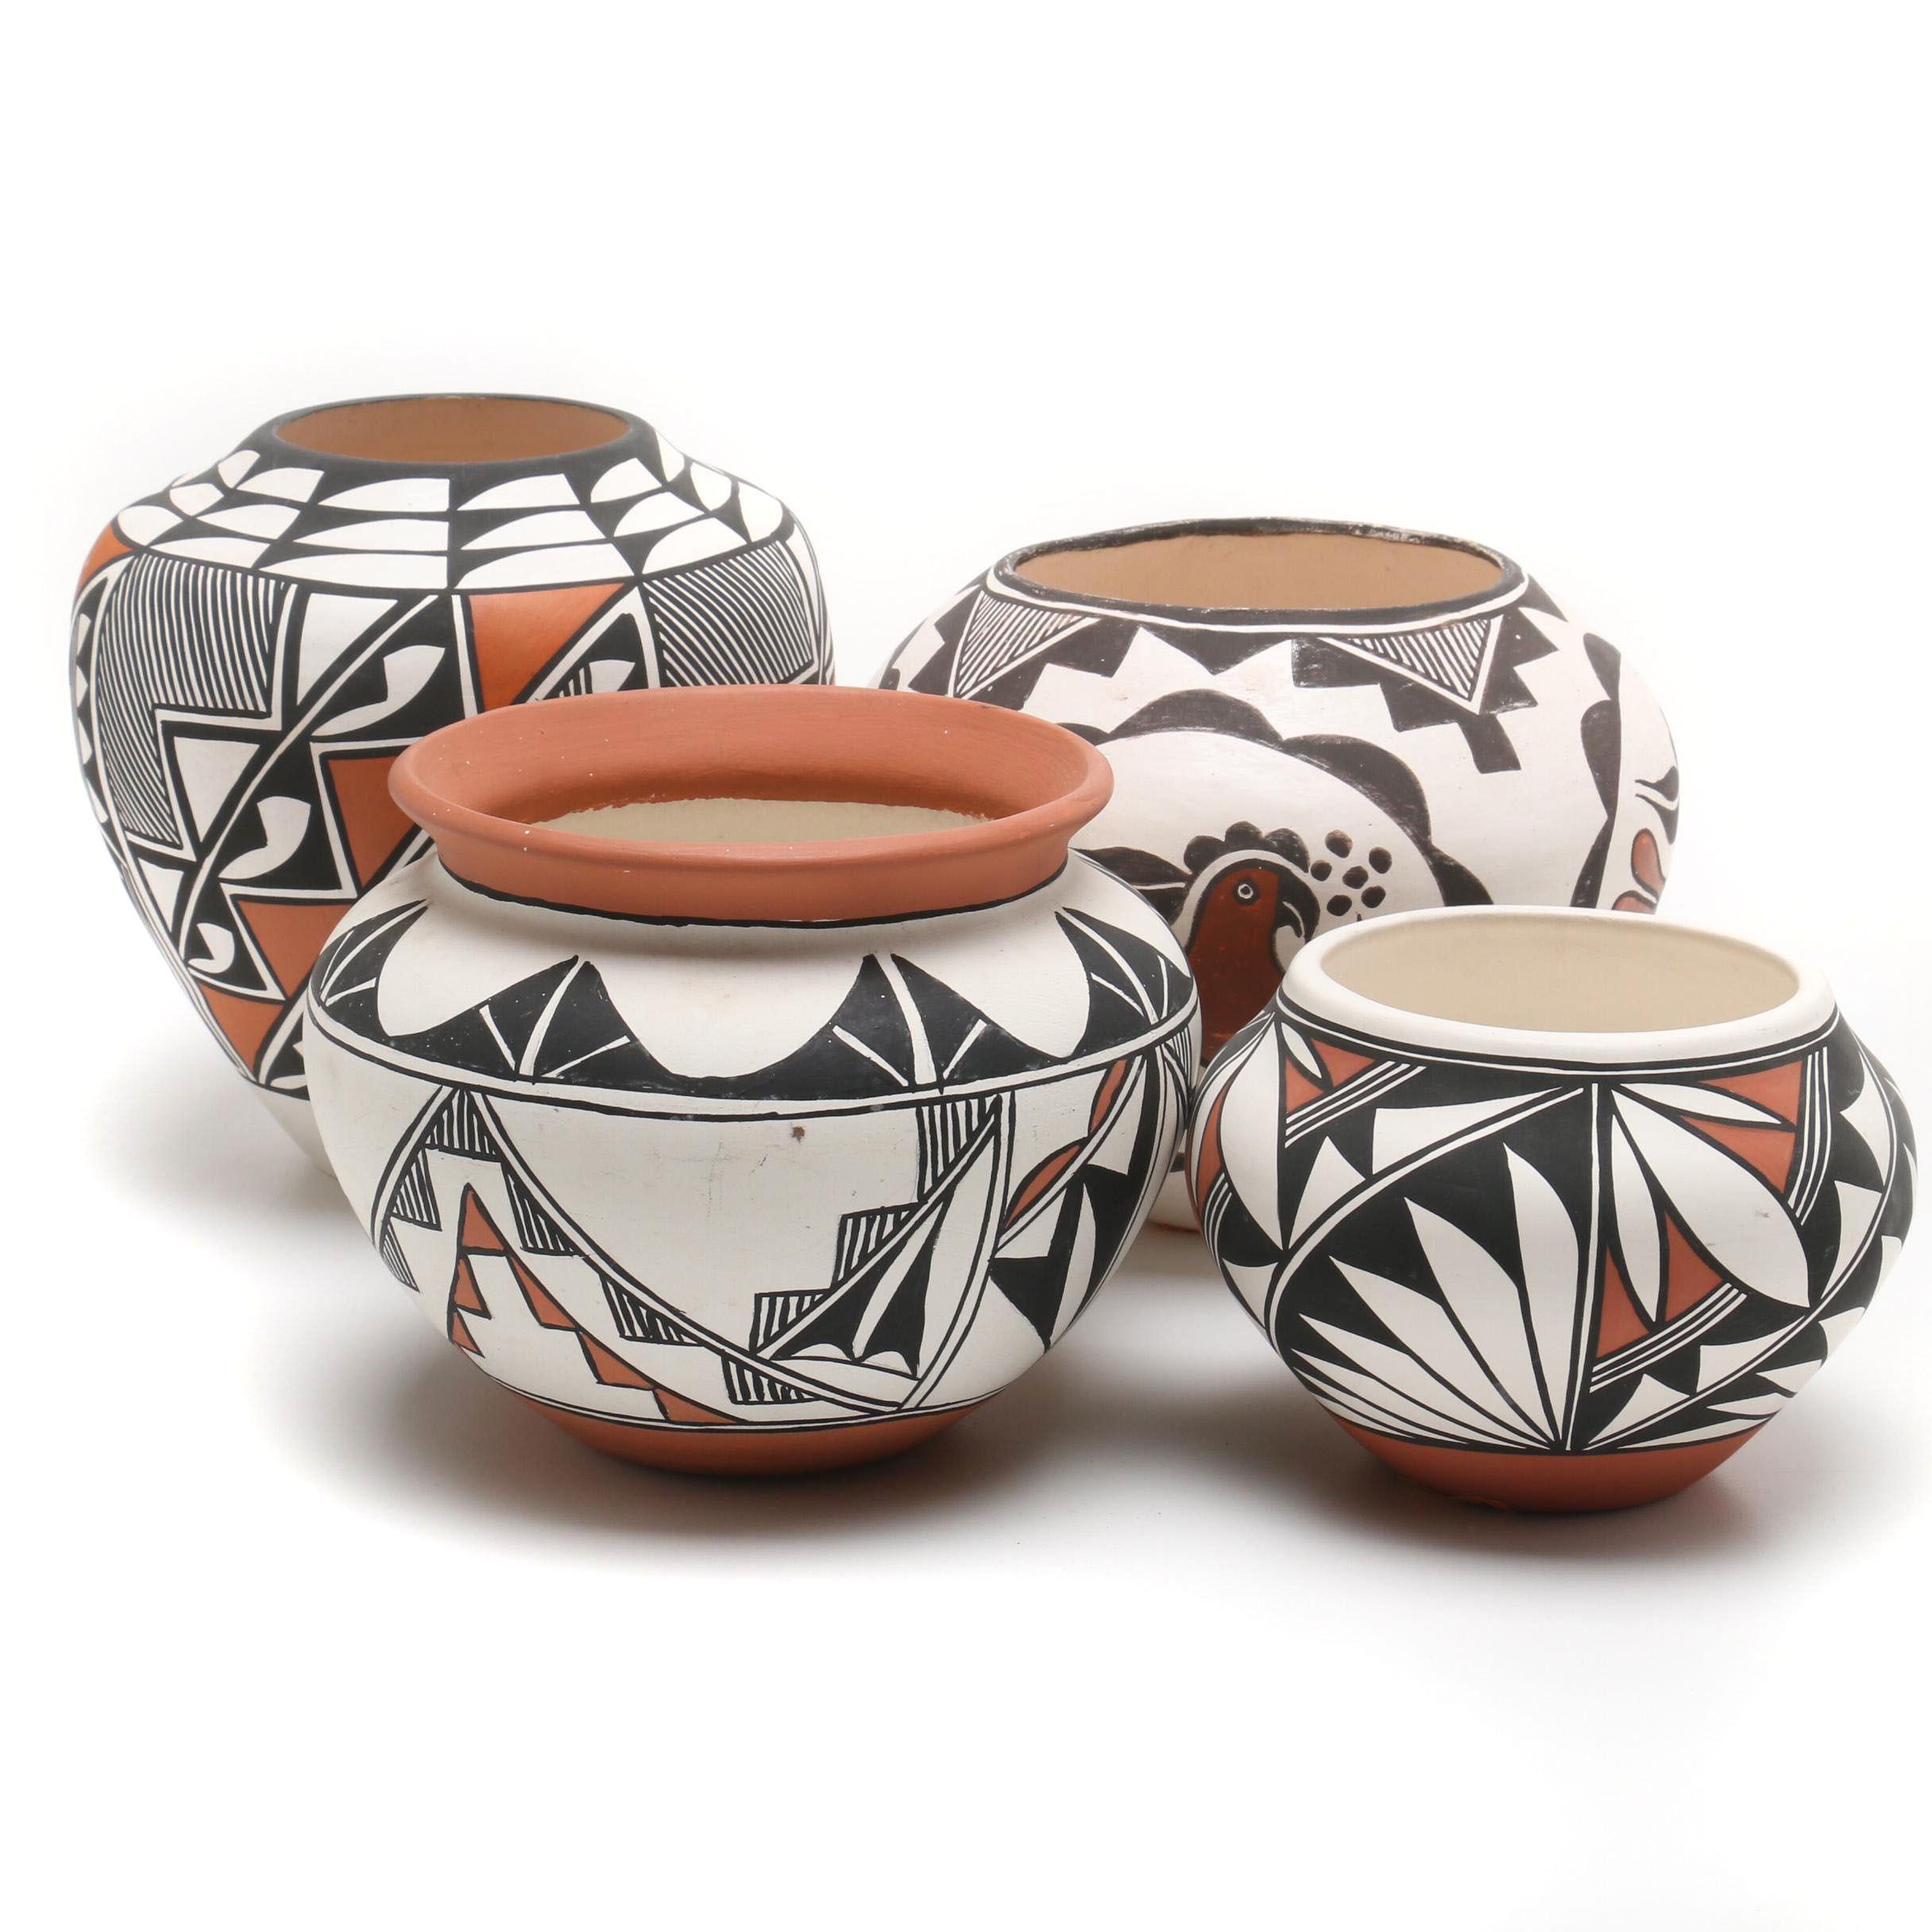 Acoma and Isleta Pueblo Polychrome Earthenware Pottery Featuring Freida Vallo